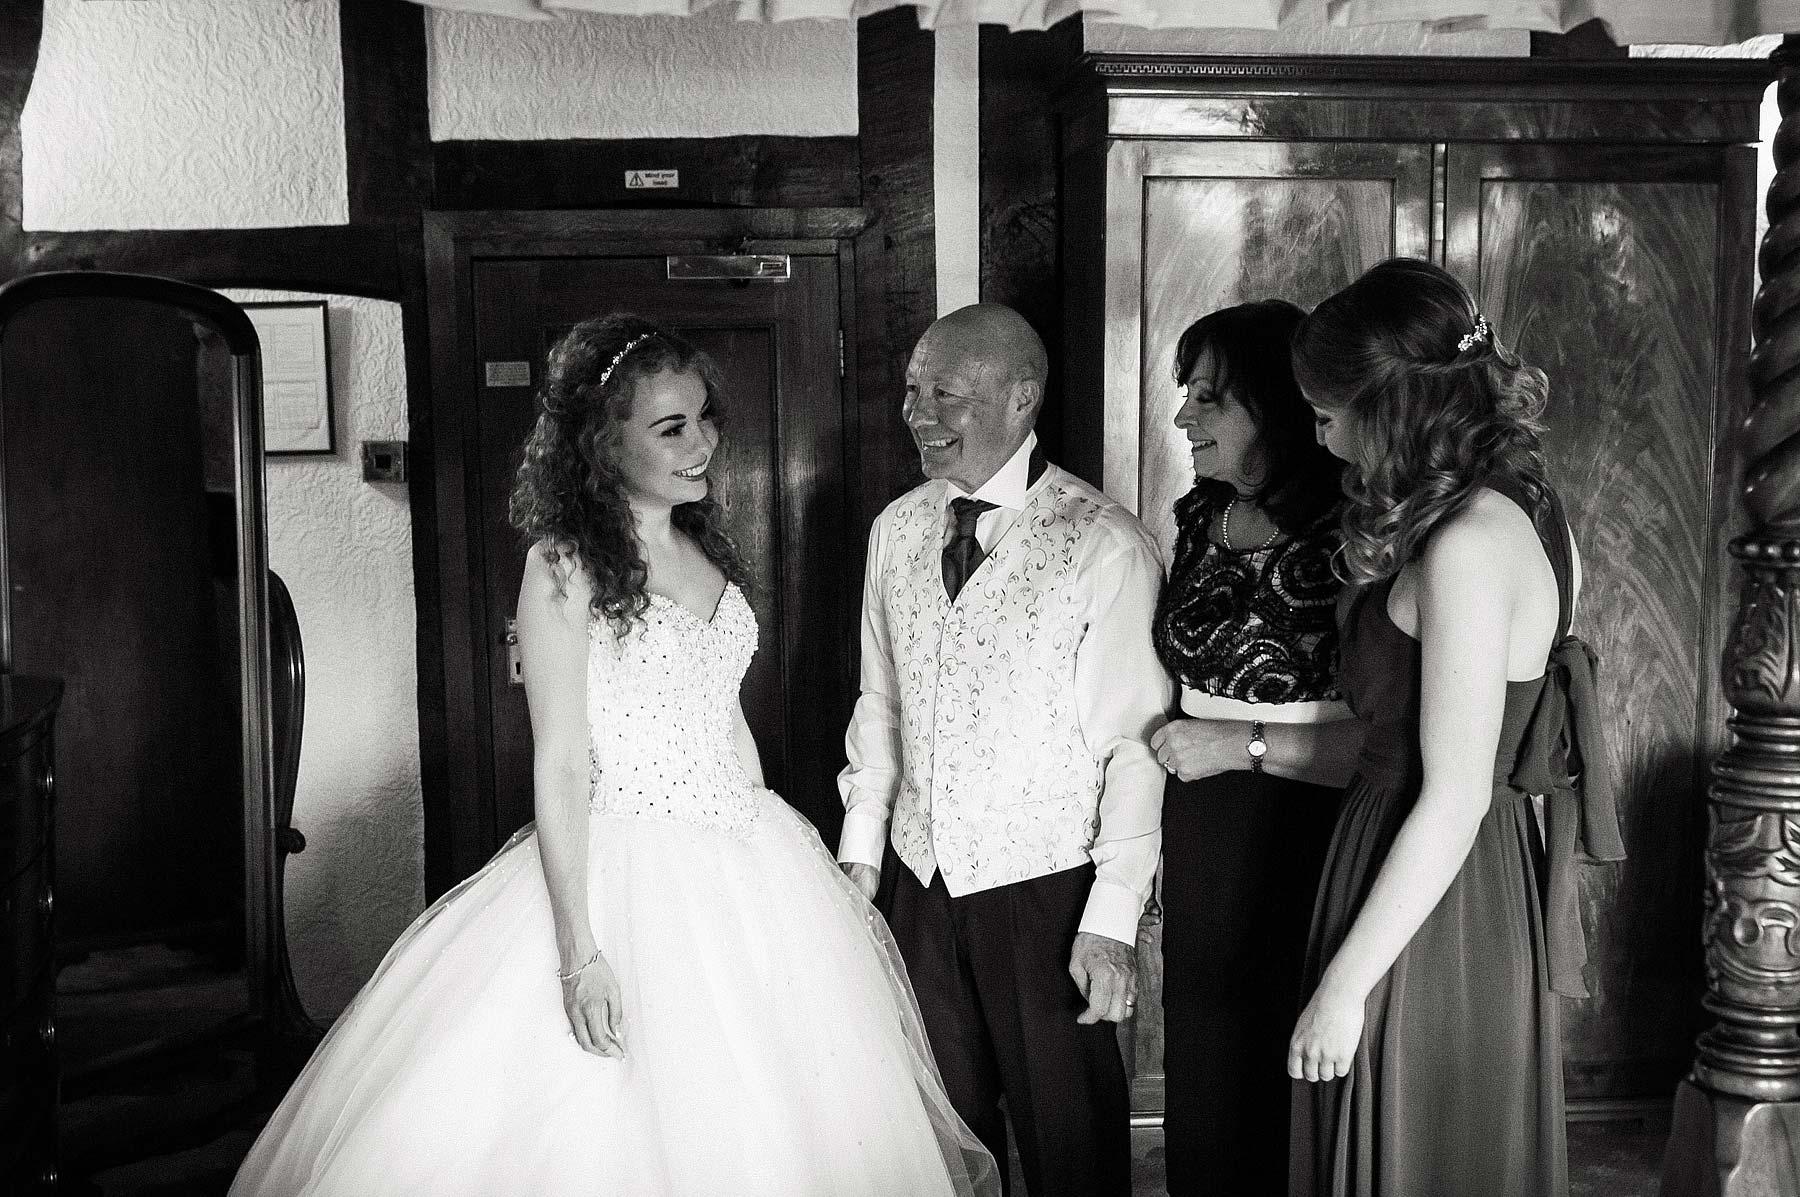 albright-hussey-manor-wedding-photographers-017